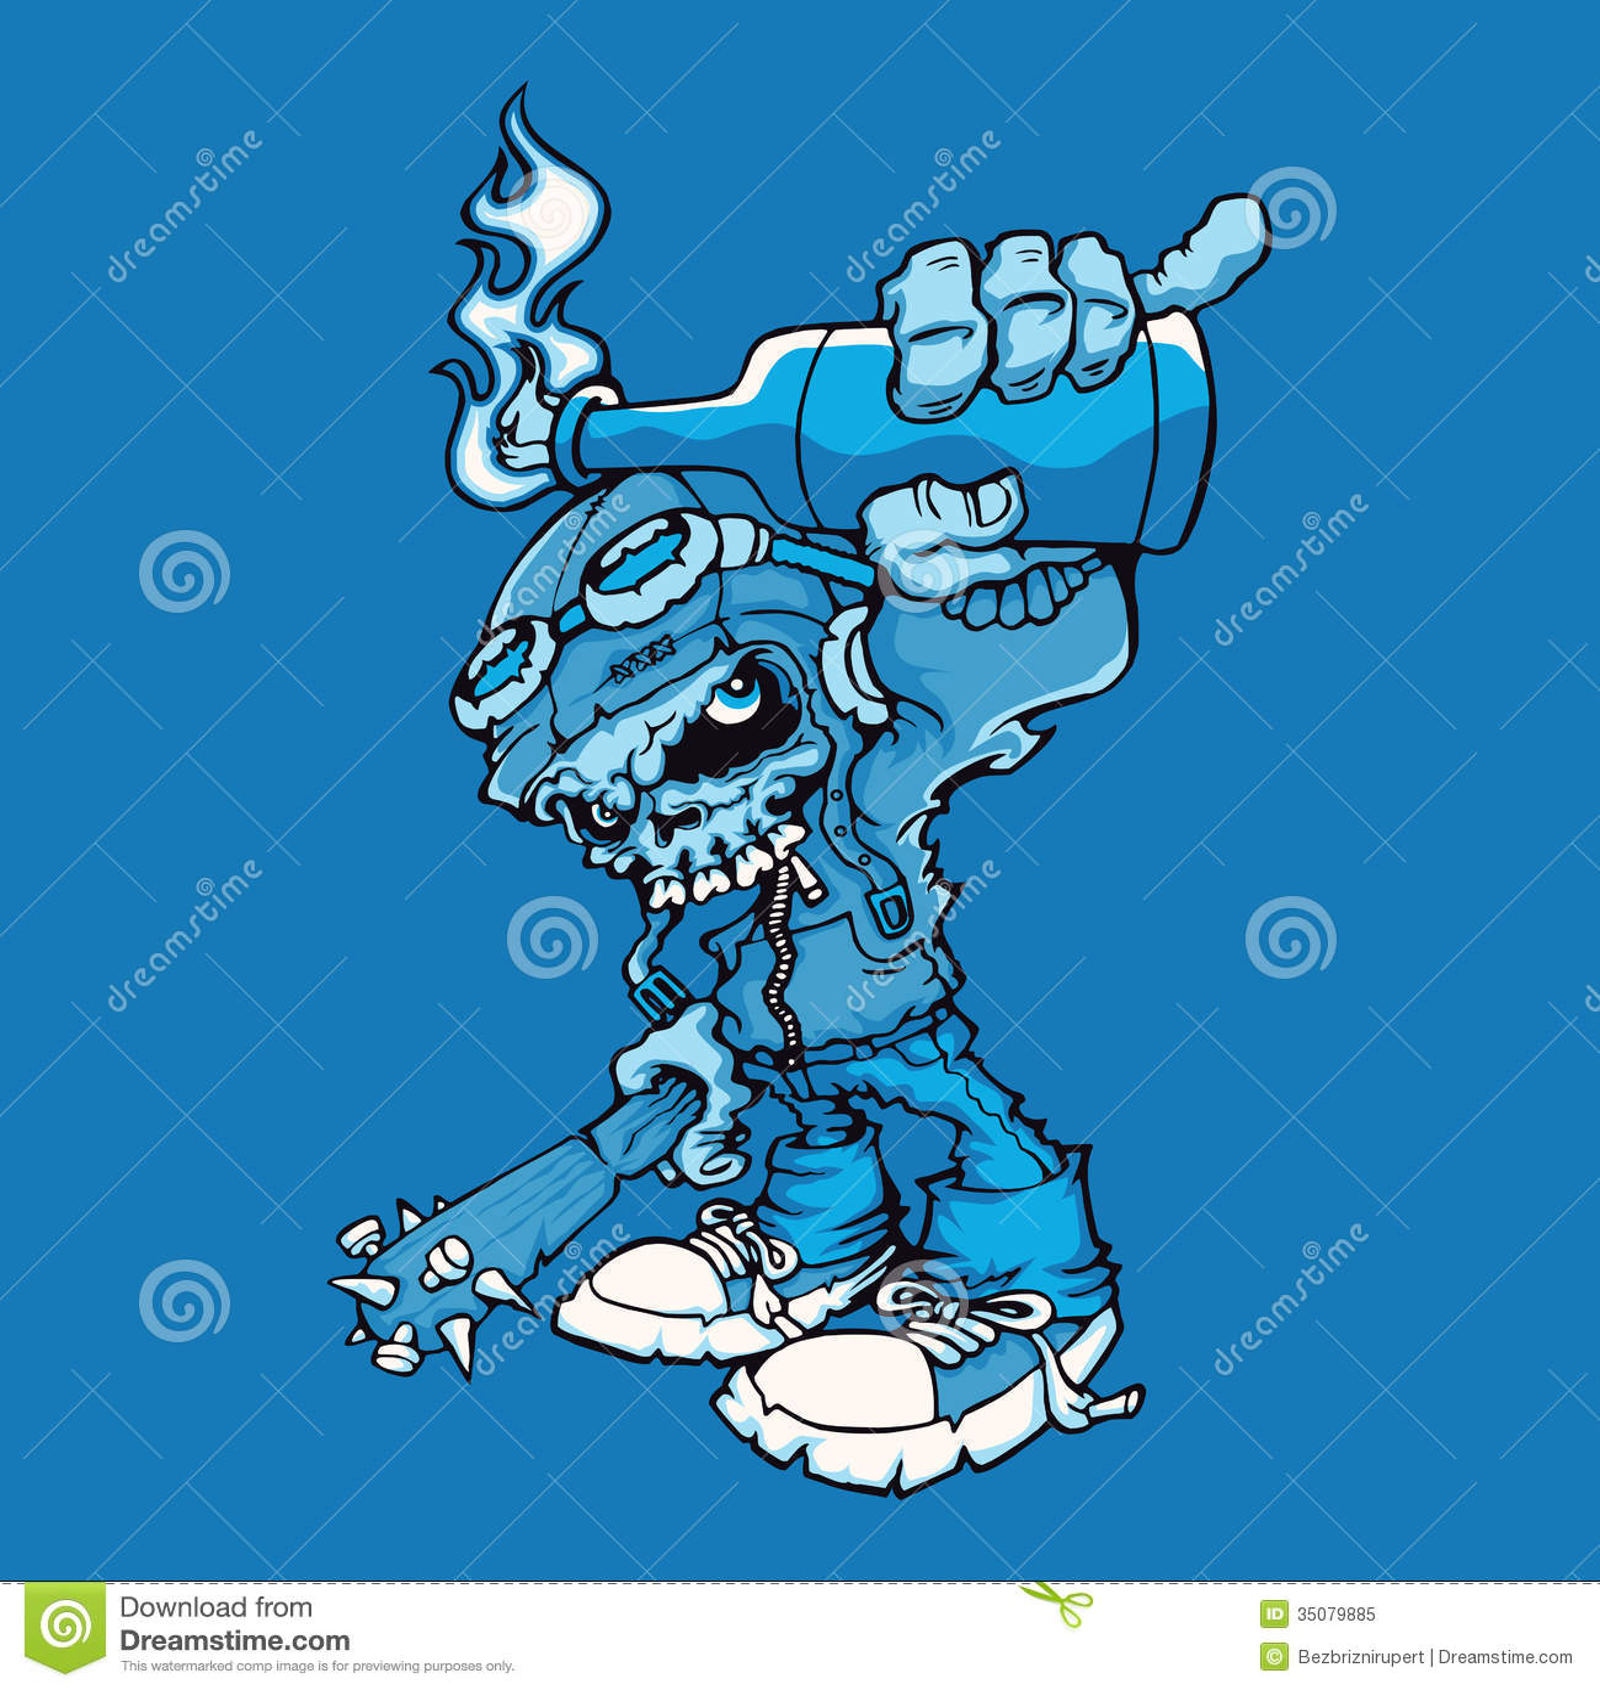 Hooligan Cartoons Illustrations Amp Vector Stock Images